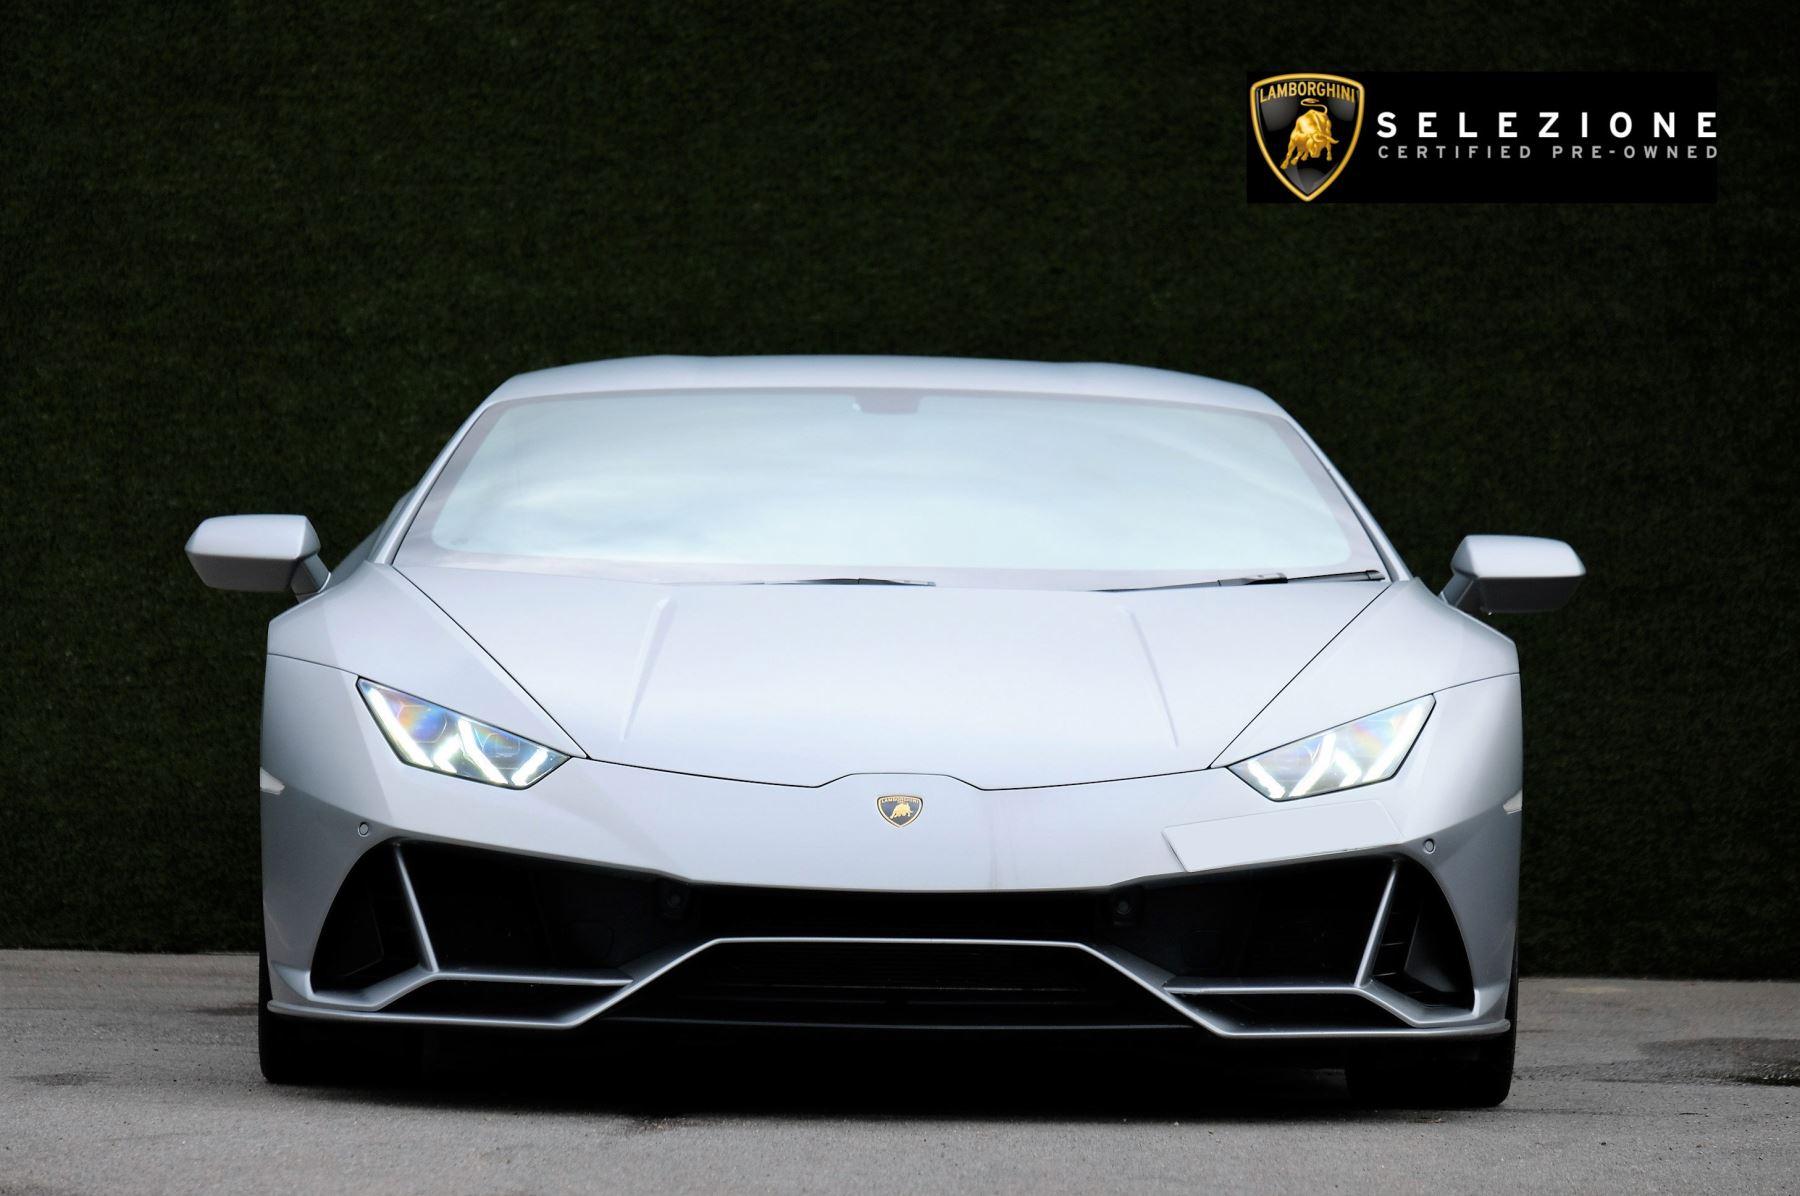 Lamborghini Huracan EVO LP 640-4 5.2 image 5